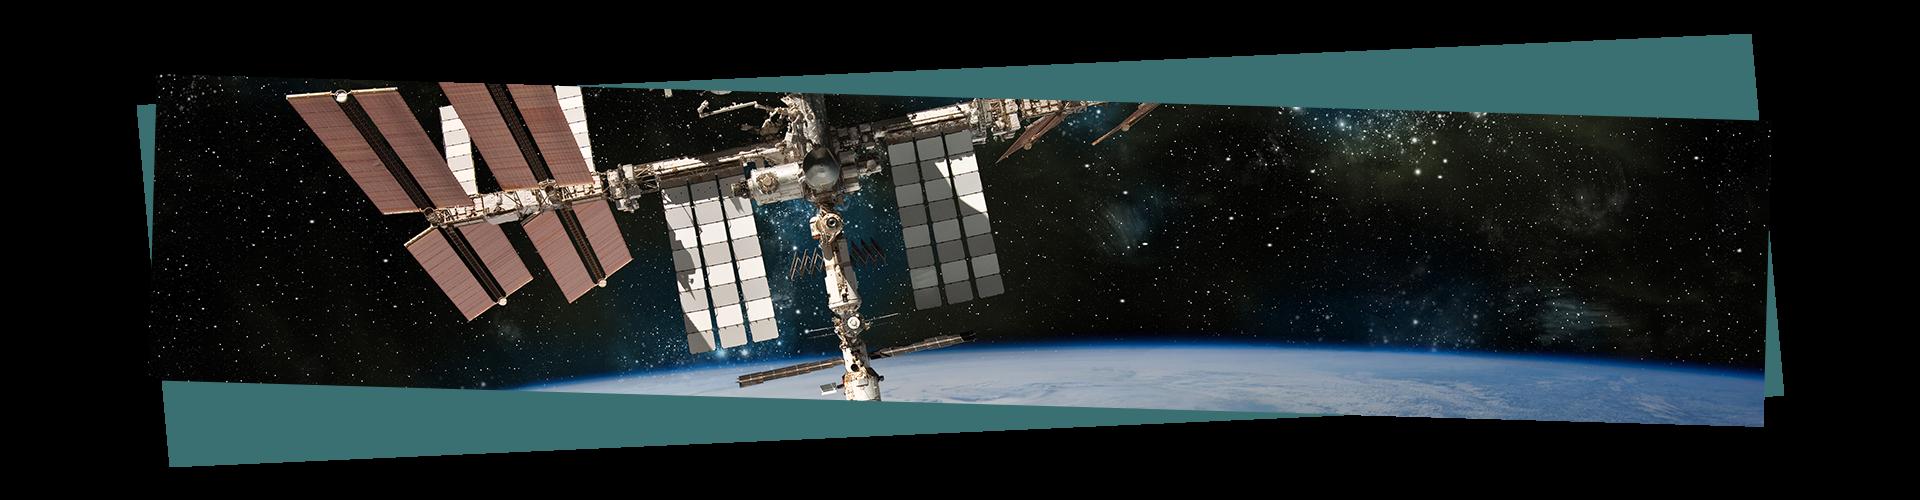 Winter stargazing - The International Space Station